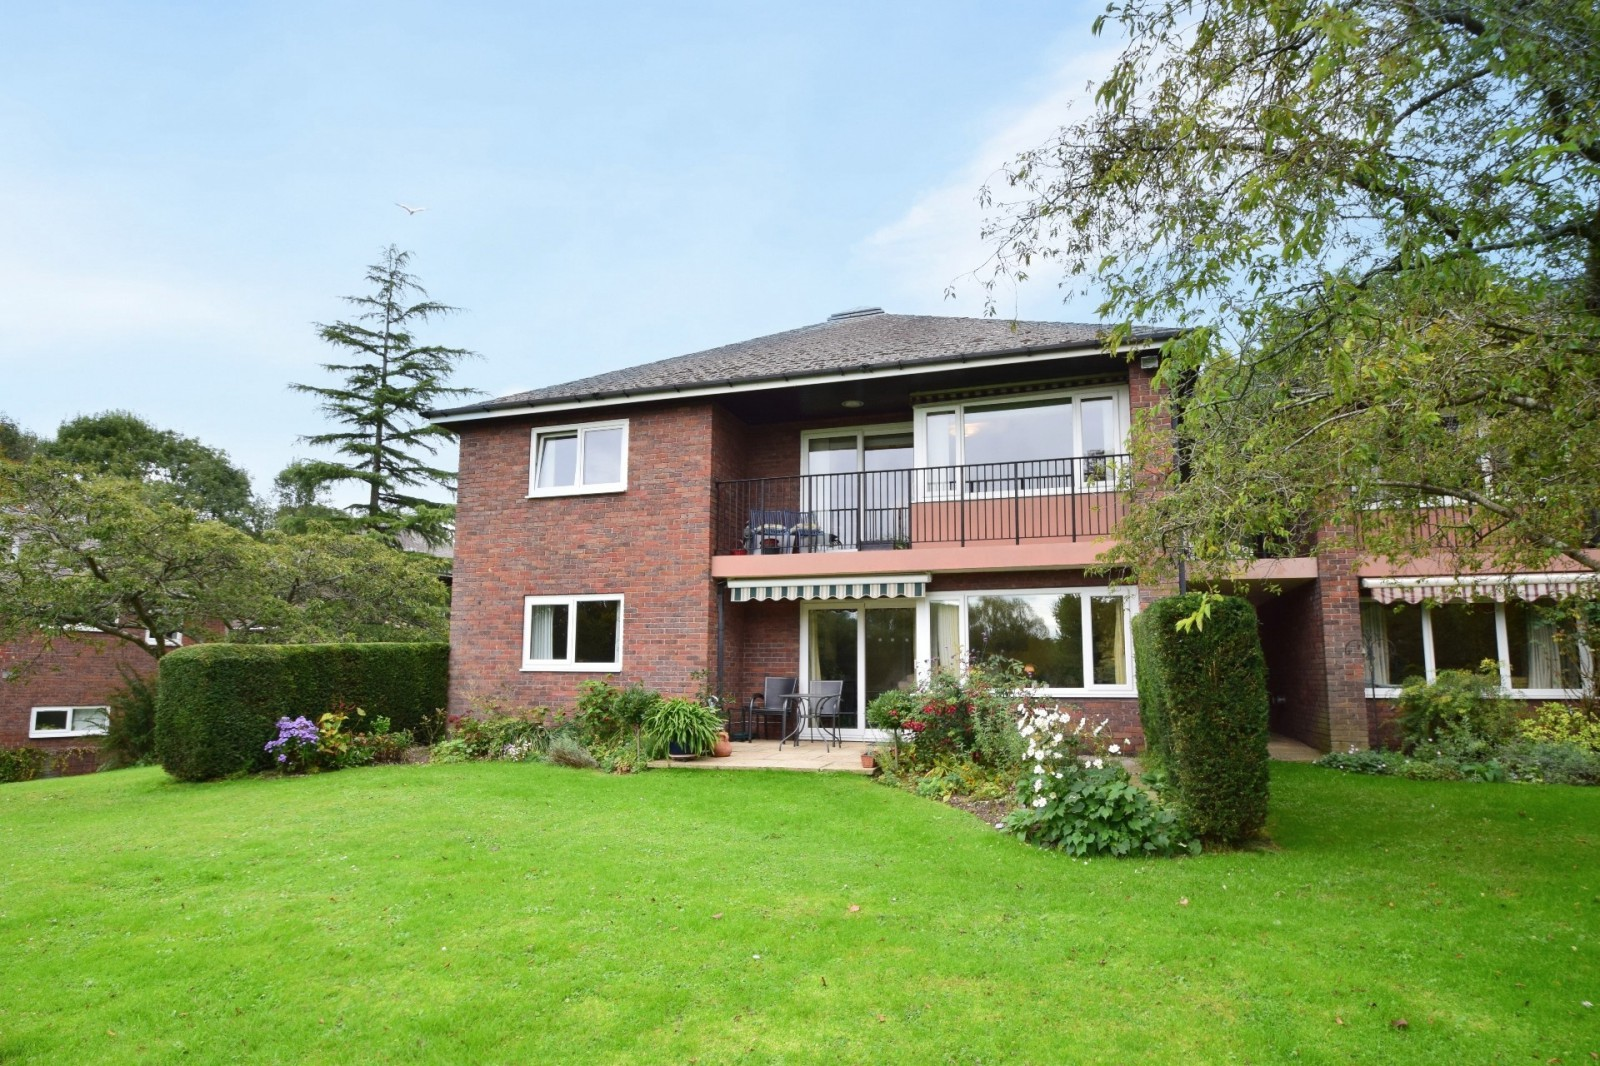 22 Headbourne Worthy House, Bedfield Lane, Winchester SO23 7JG